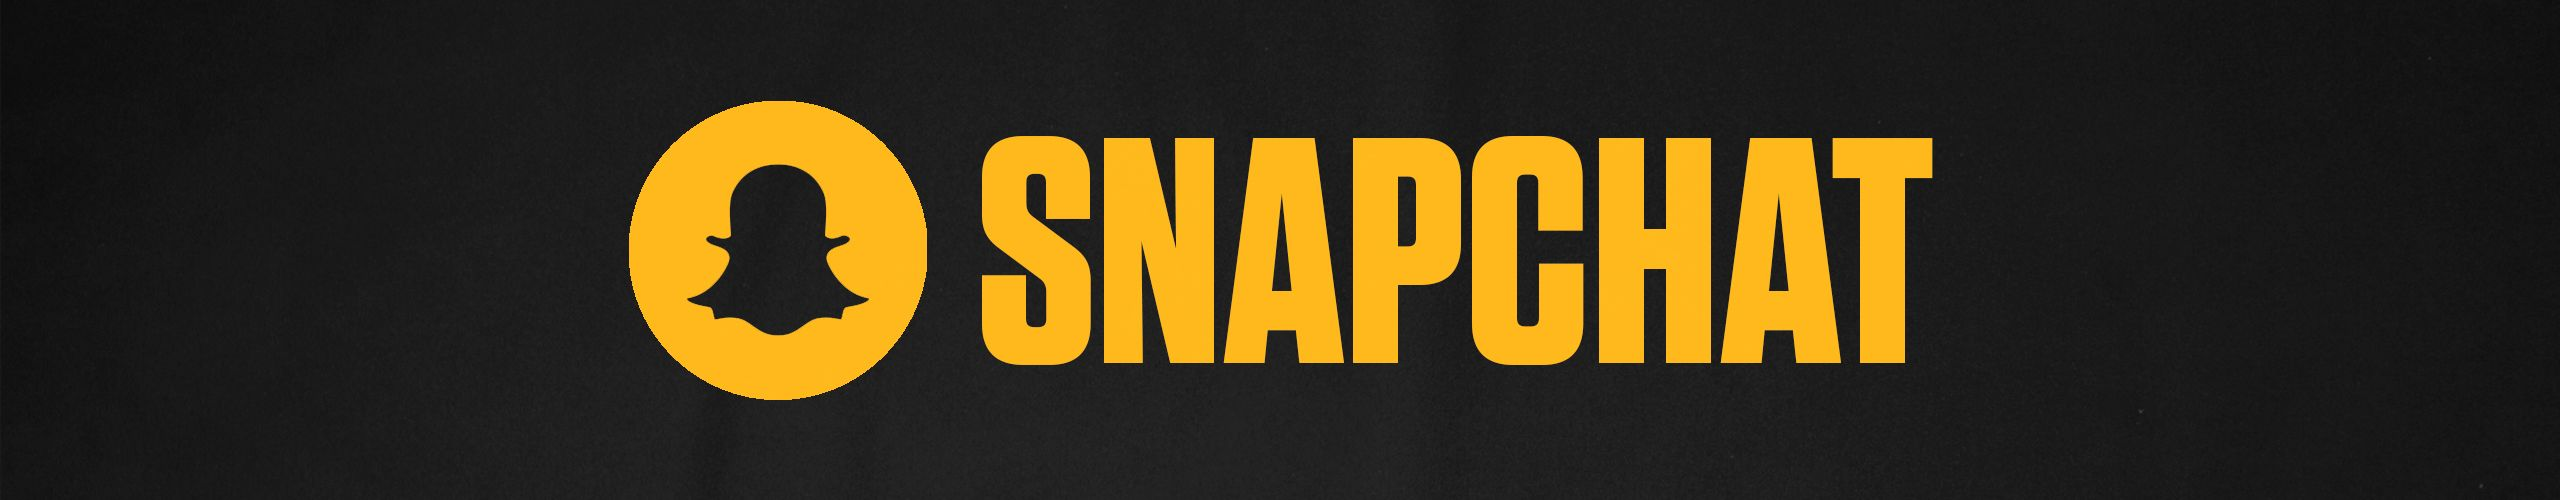 W-Snapchat-2560x500-Badge